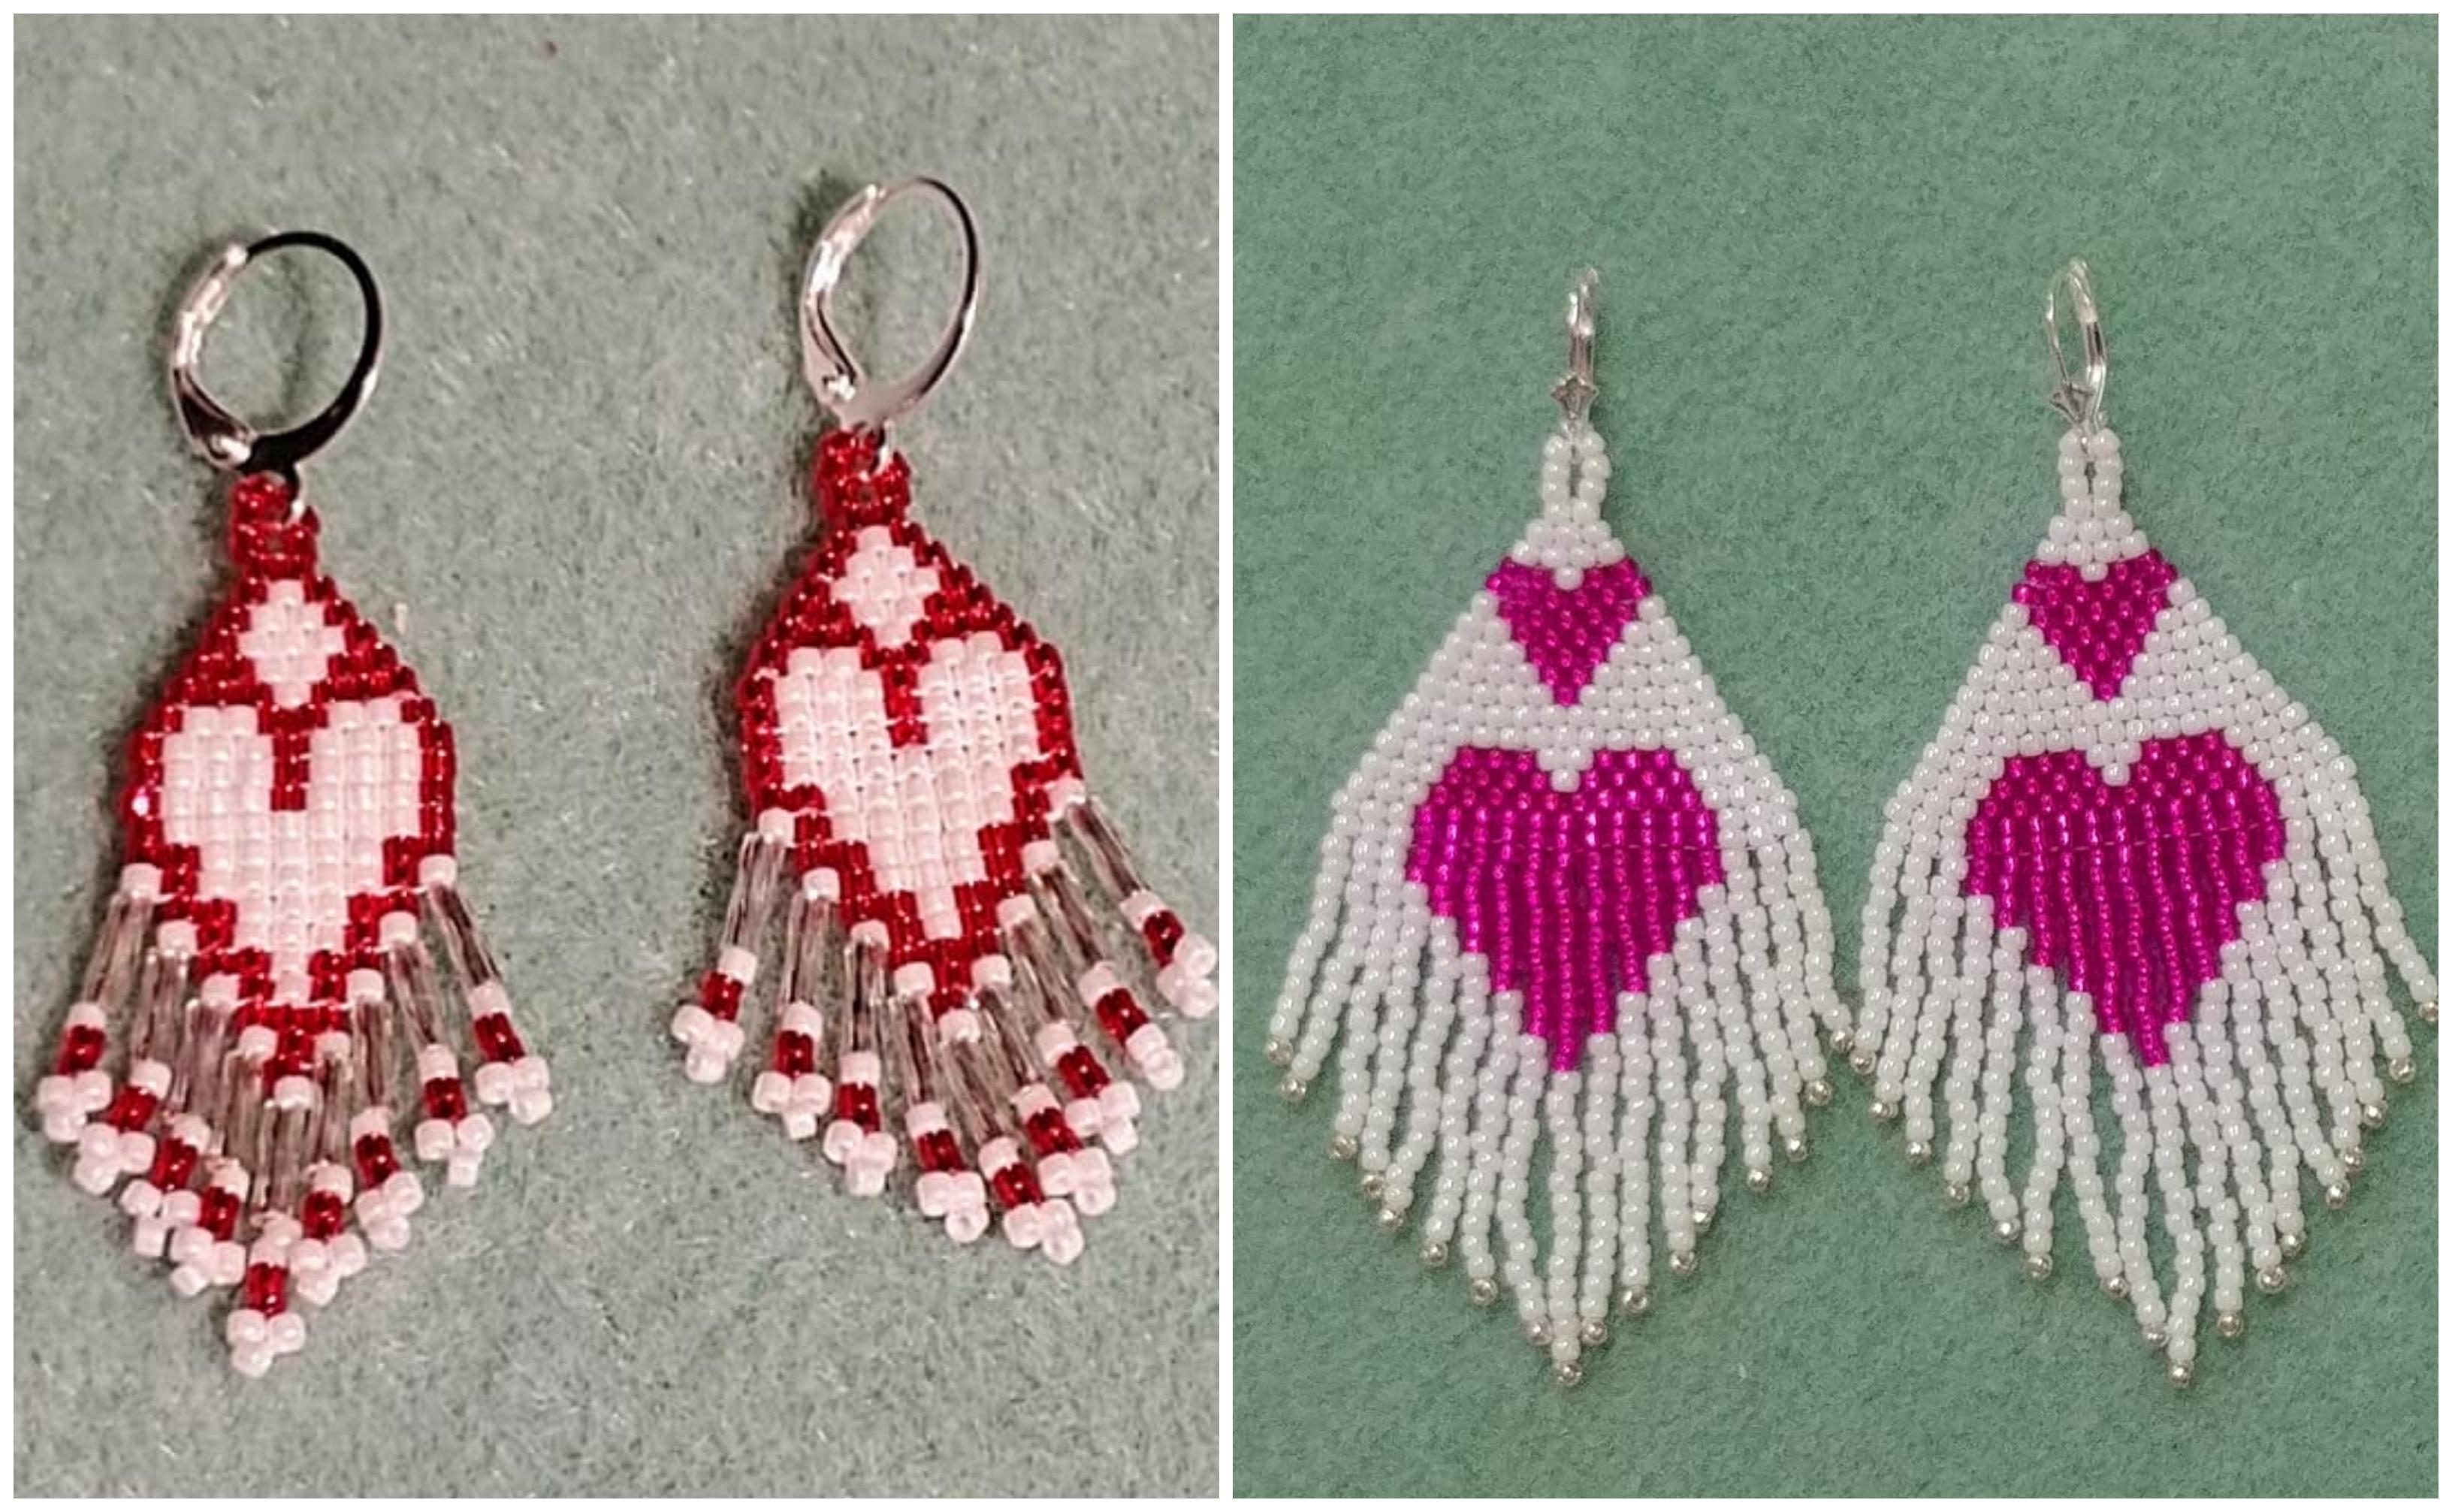 Heart earrings by Darlene Richardson Reddick